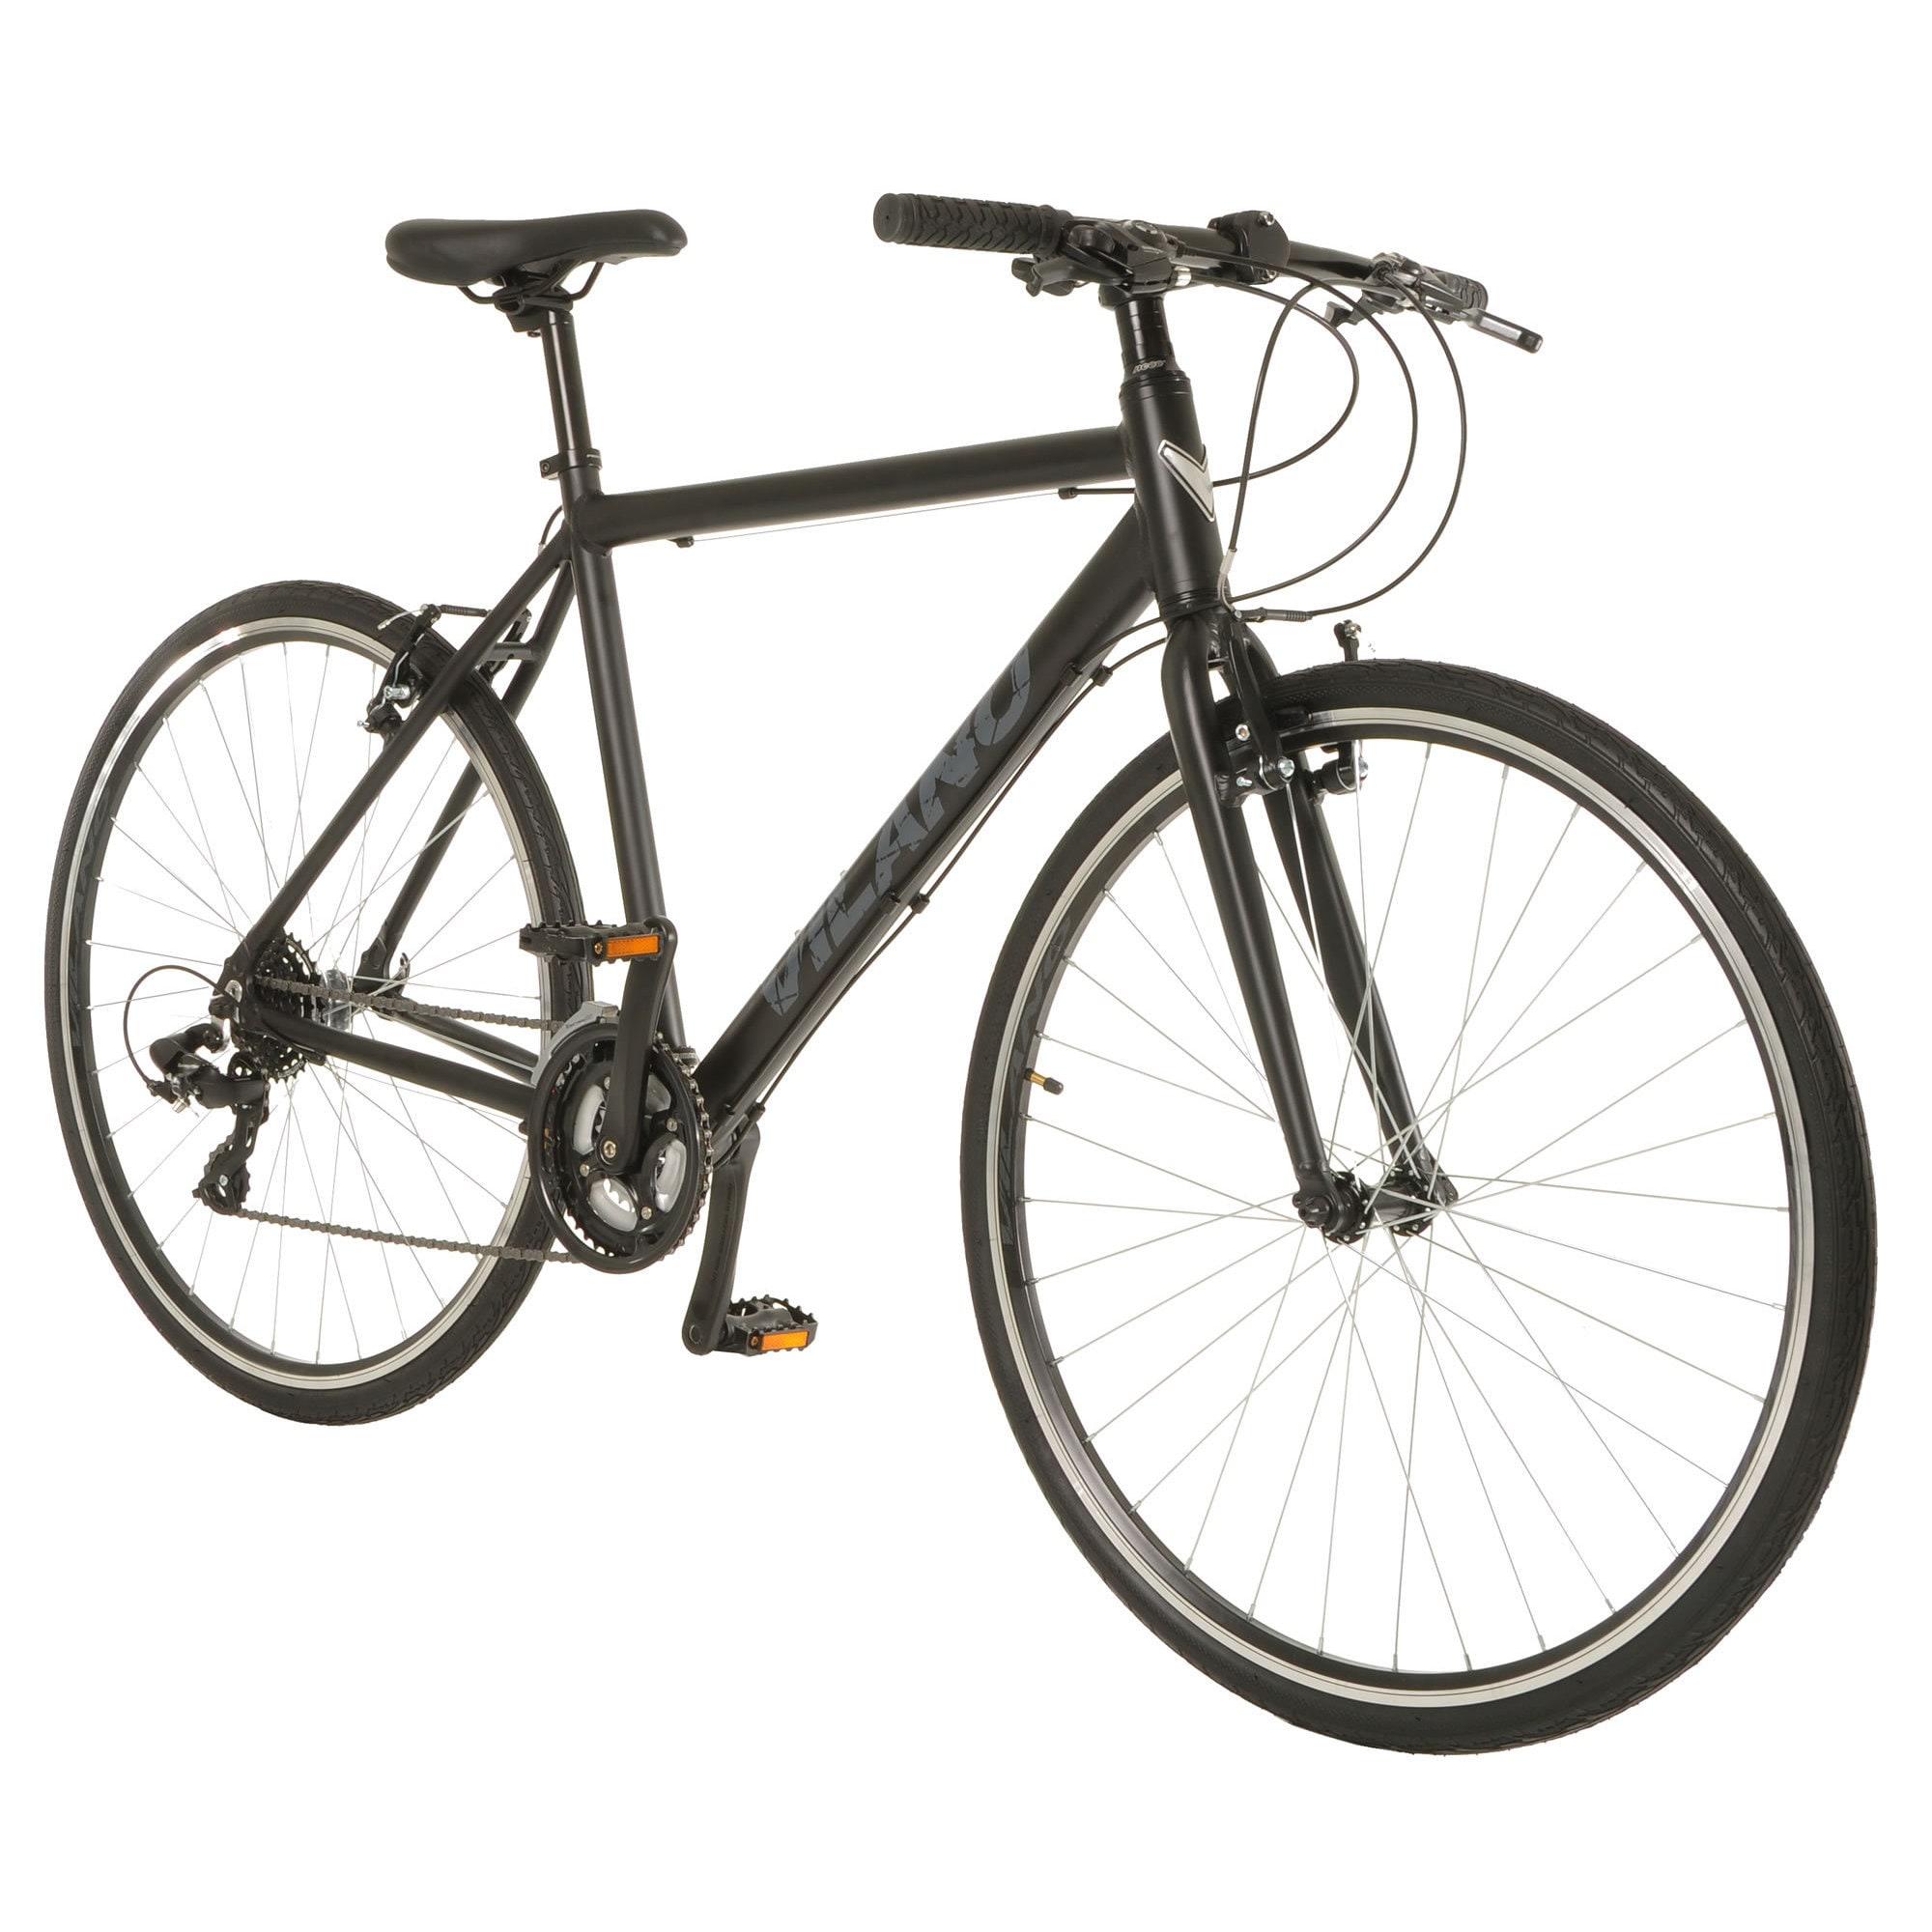 669ed6a3c41 Vilano Diverse 2.0 Performance 24-speed 700c Hybrid Bike Shimano Road Bike